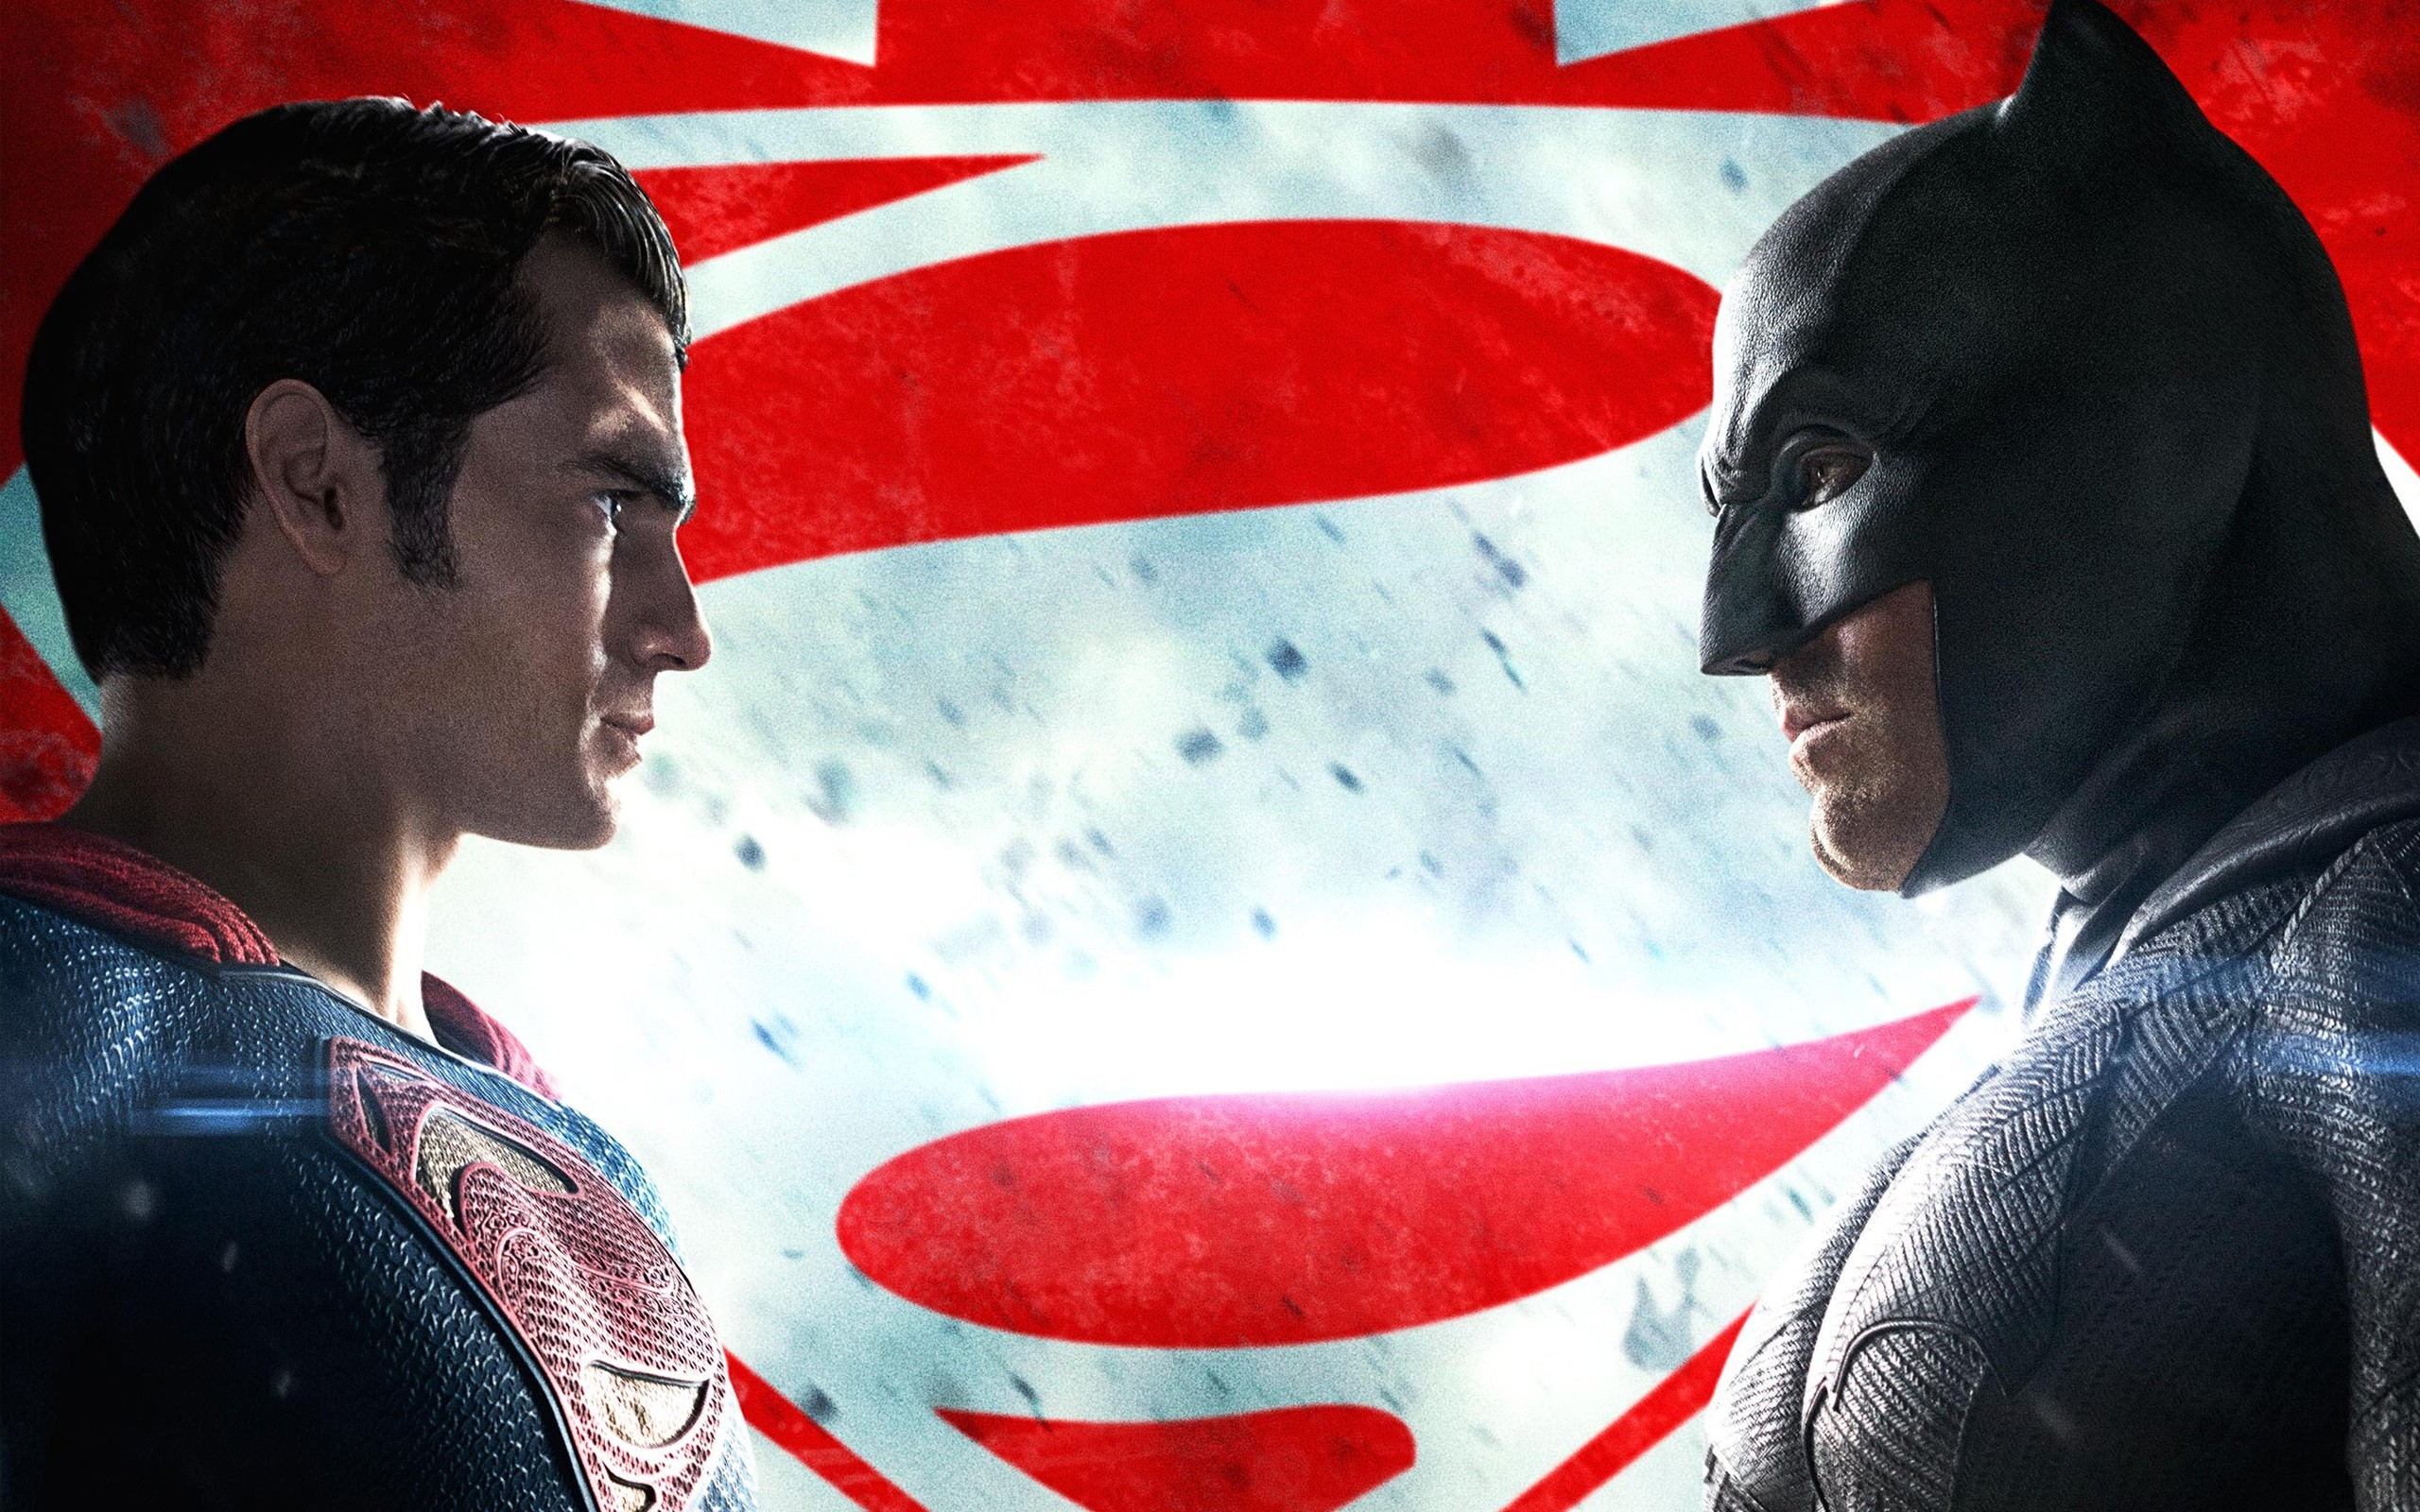 2048x1152 batman vs superman dawn of justice 2048x1152 resolution hd batman vs superman dawn of justice 2048x1152 resolution voltagebd Gallery